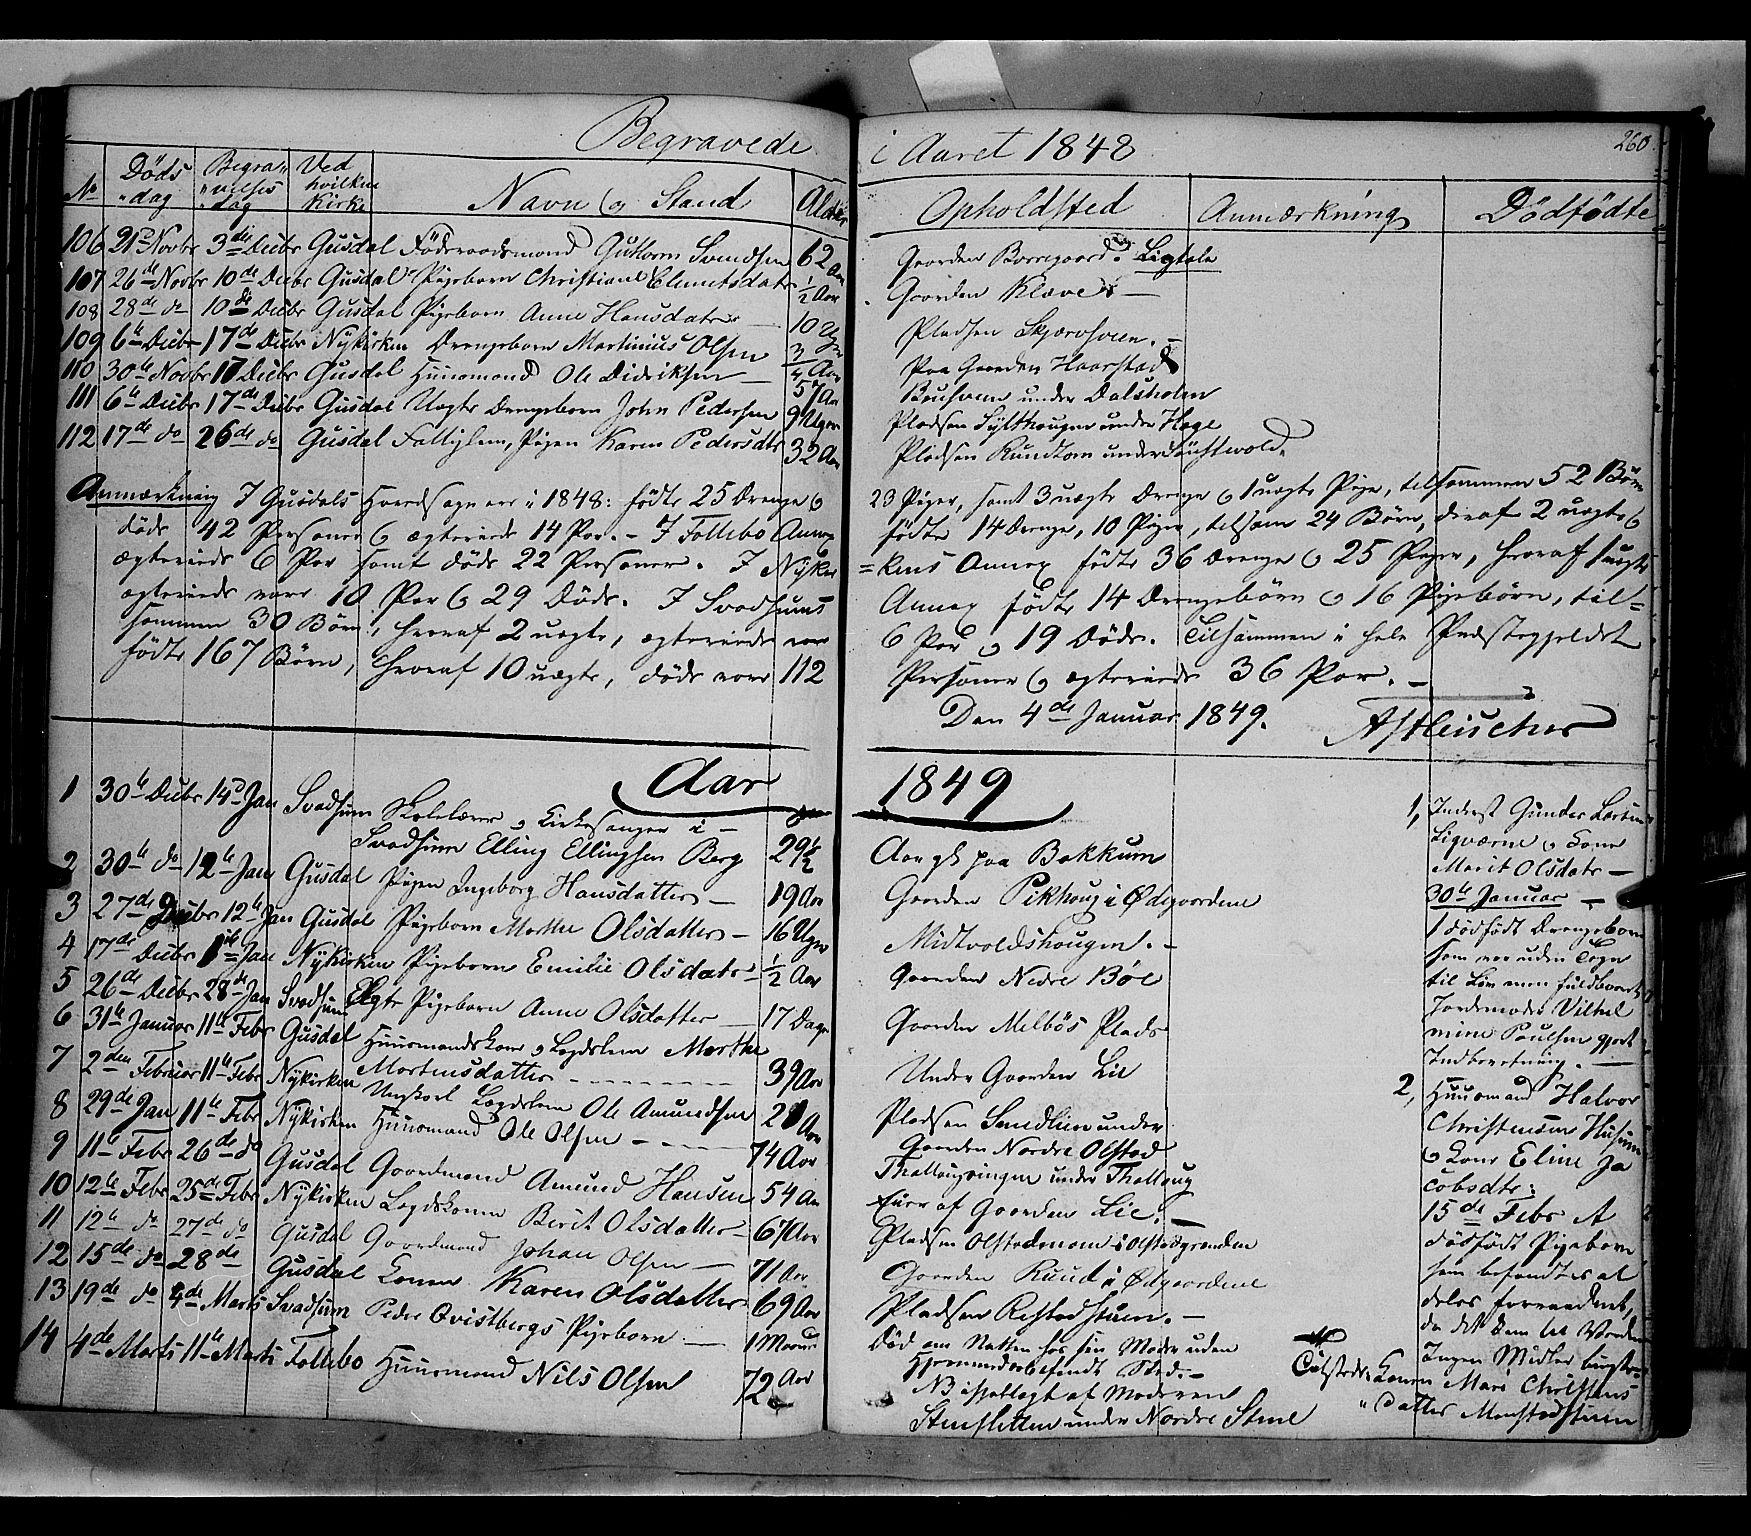 SAH, Gausdal prestekontor, Ministerialbok nr. 7, 1840-1850, s. 260